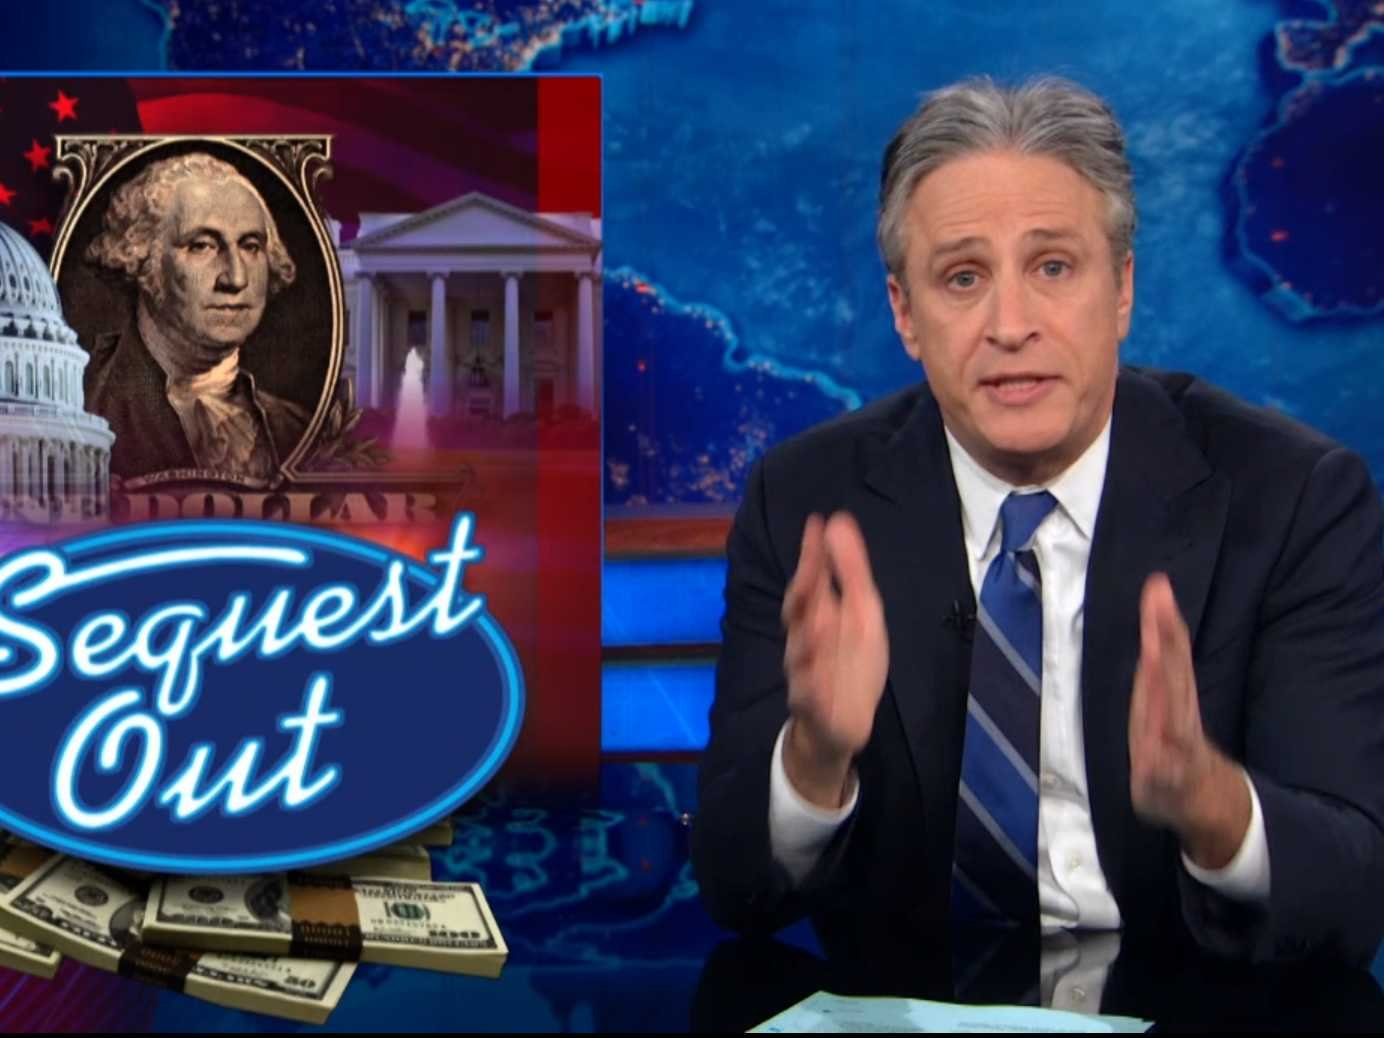 Jon Stewart Daily Show sequester